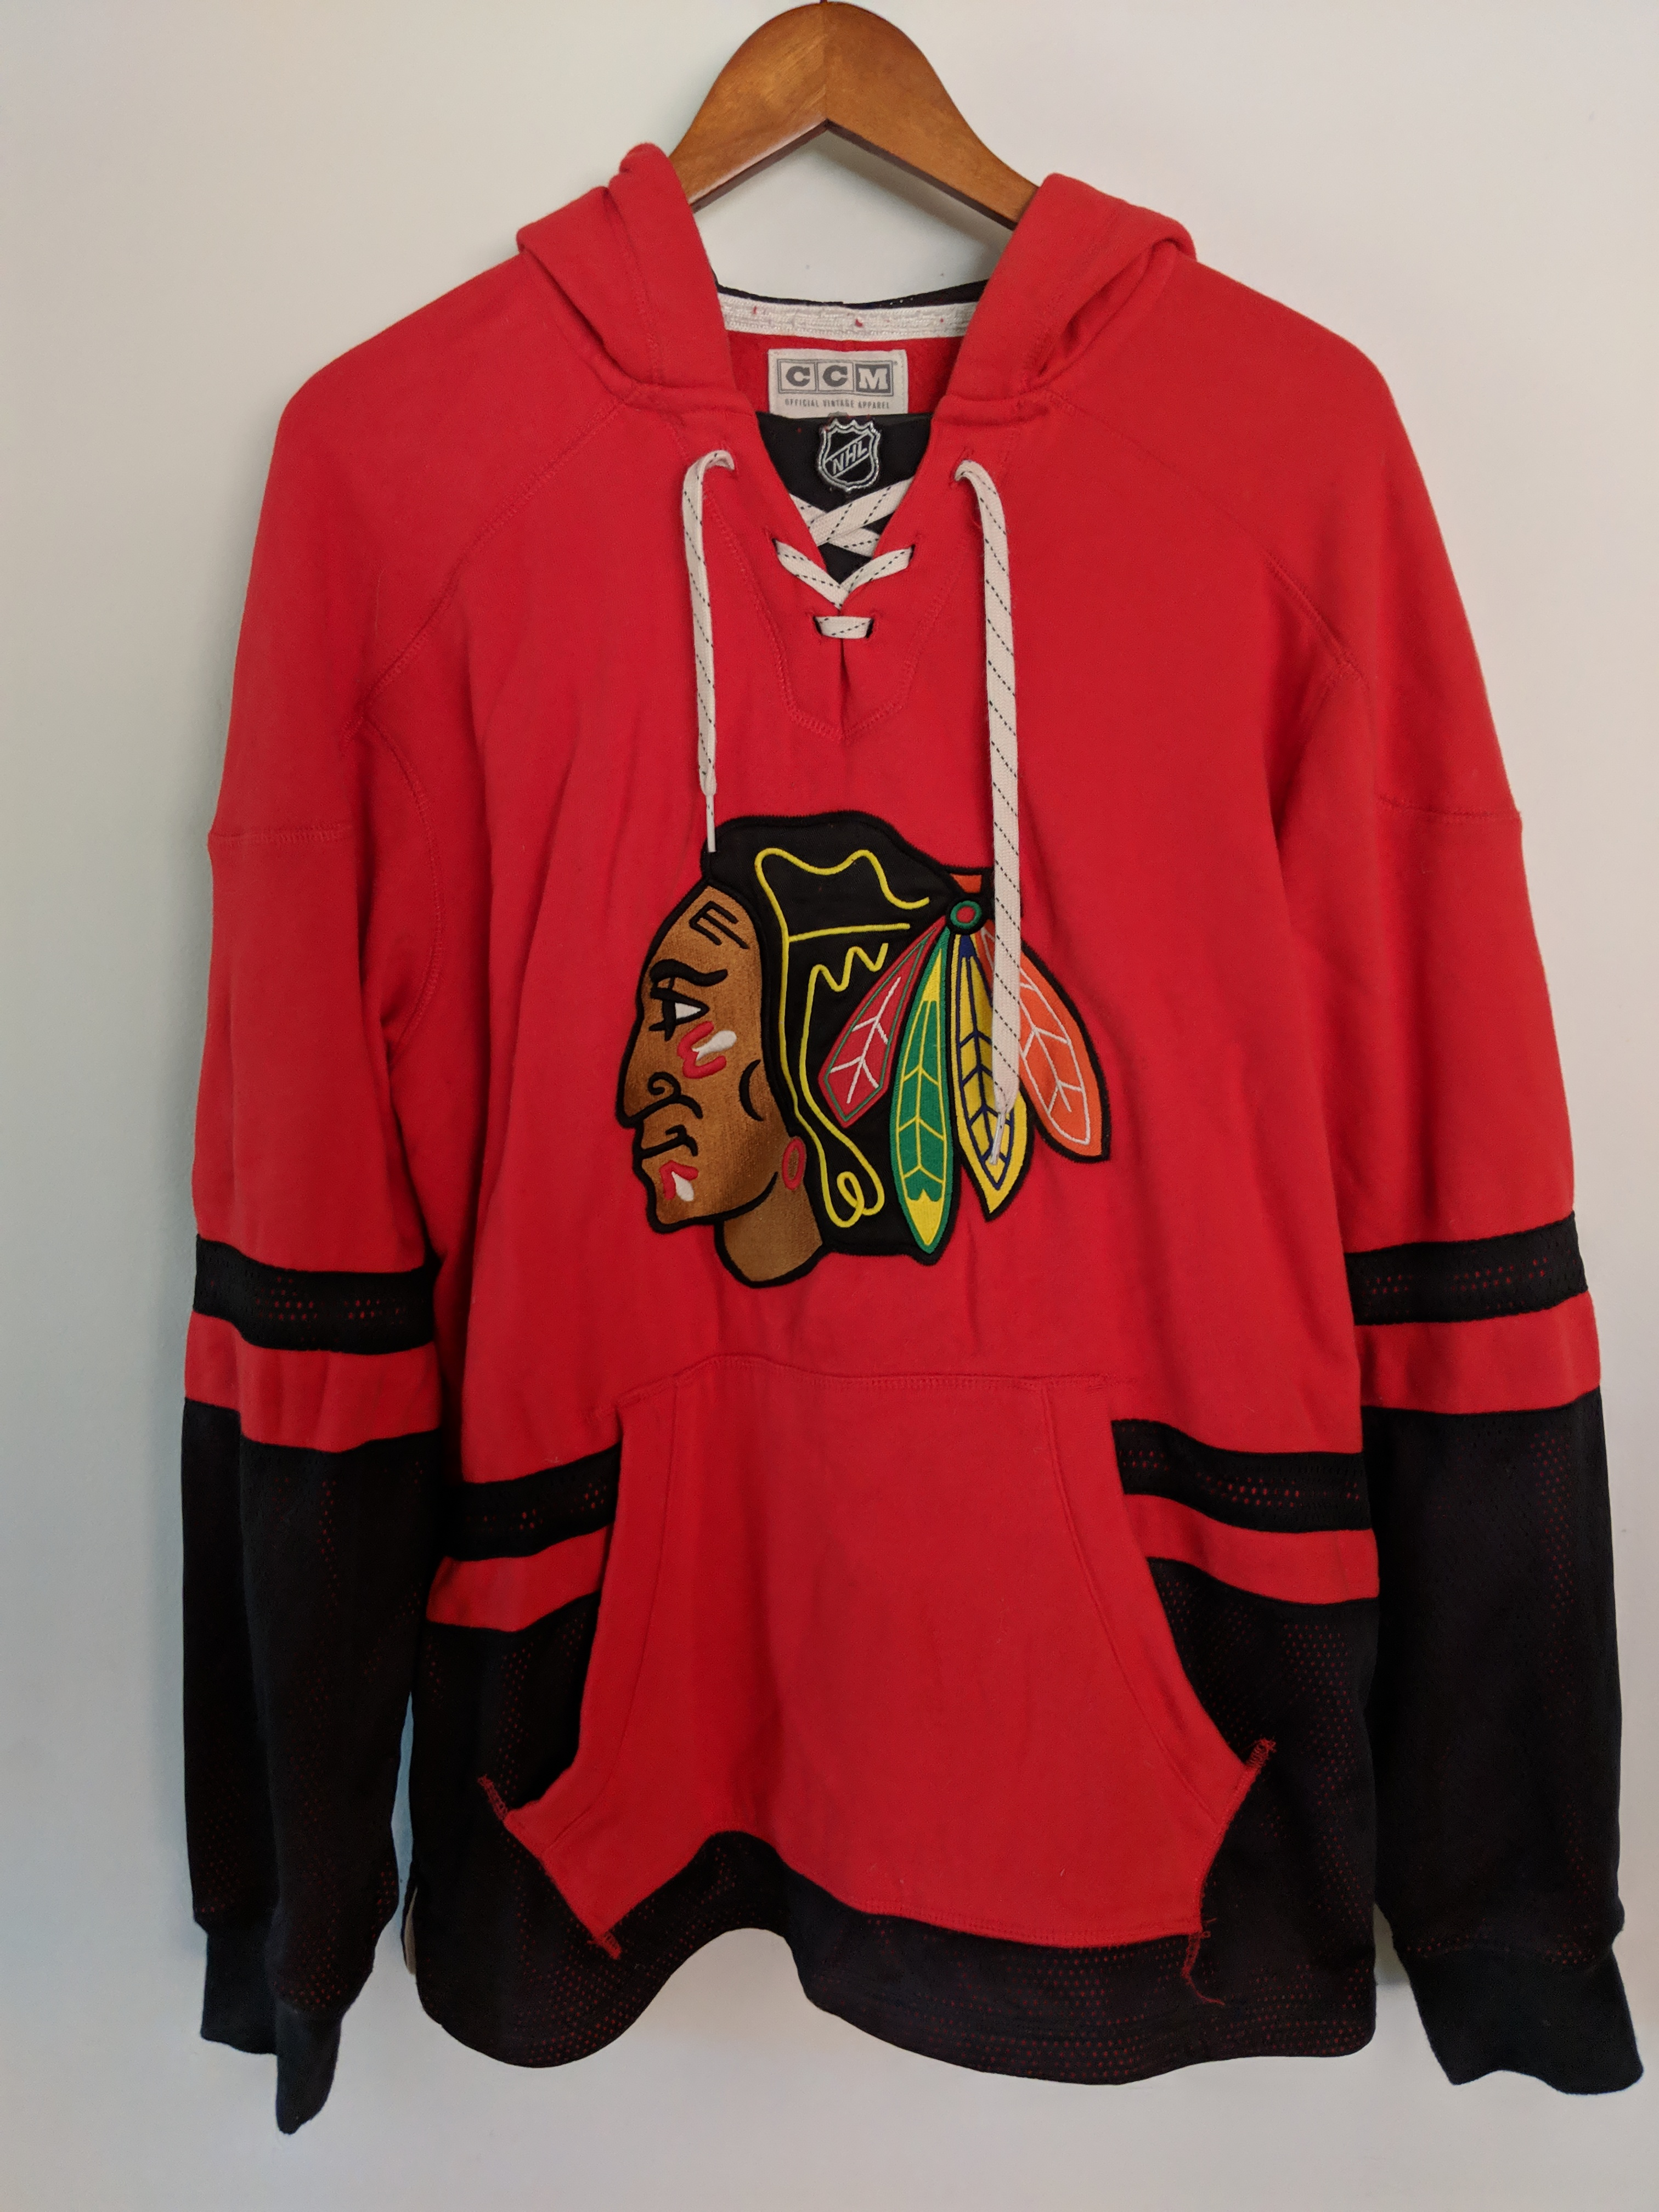 4ca844416 Vintage Chicago Blackhawks Sweatshirts – EDGE Engineering and ...